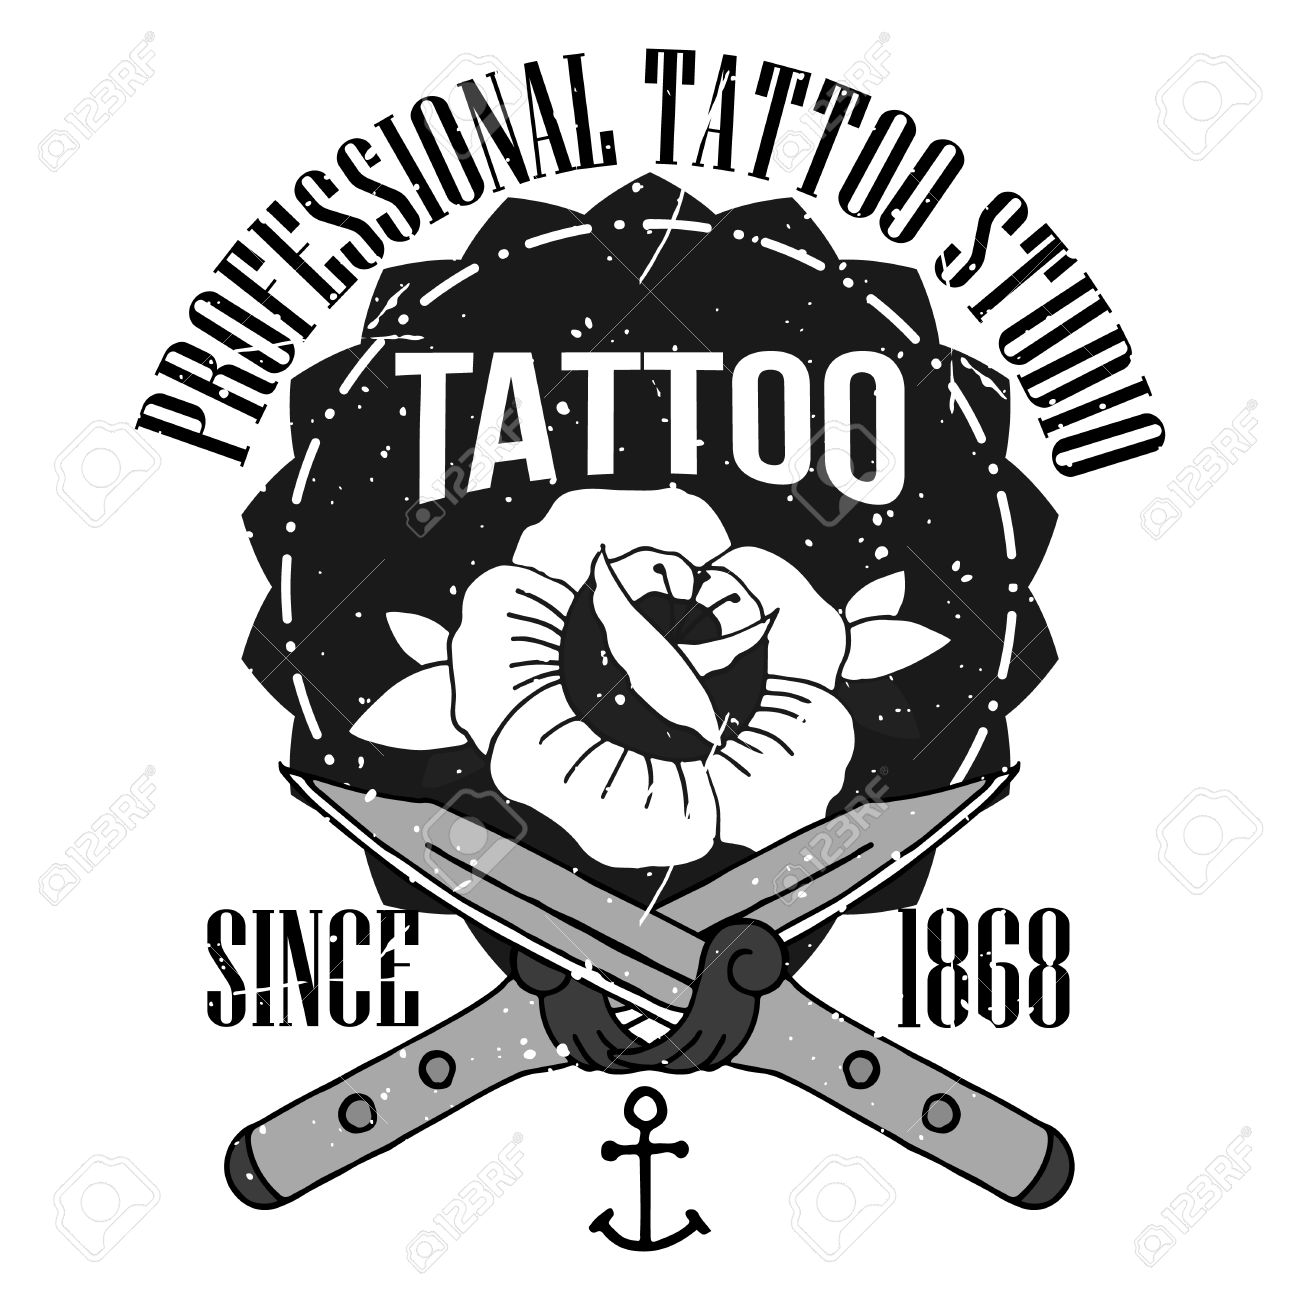 Design t shirt school - Homemade Tattoo T Shirt Design Old School Style Stock Photo 43049150